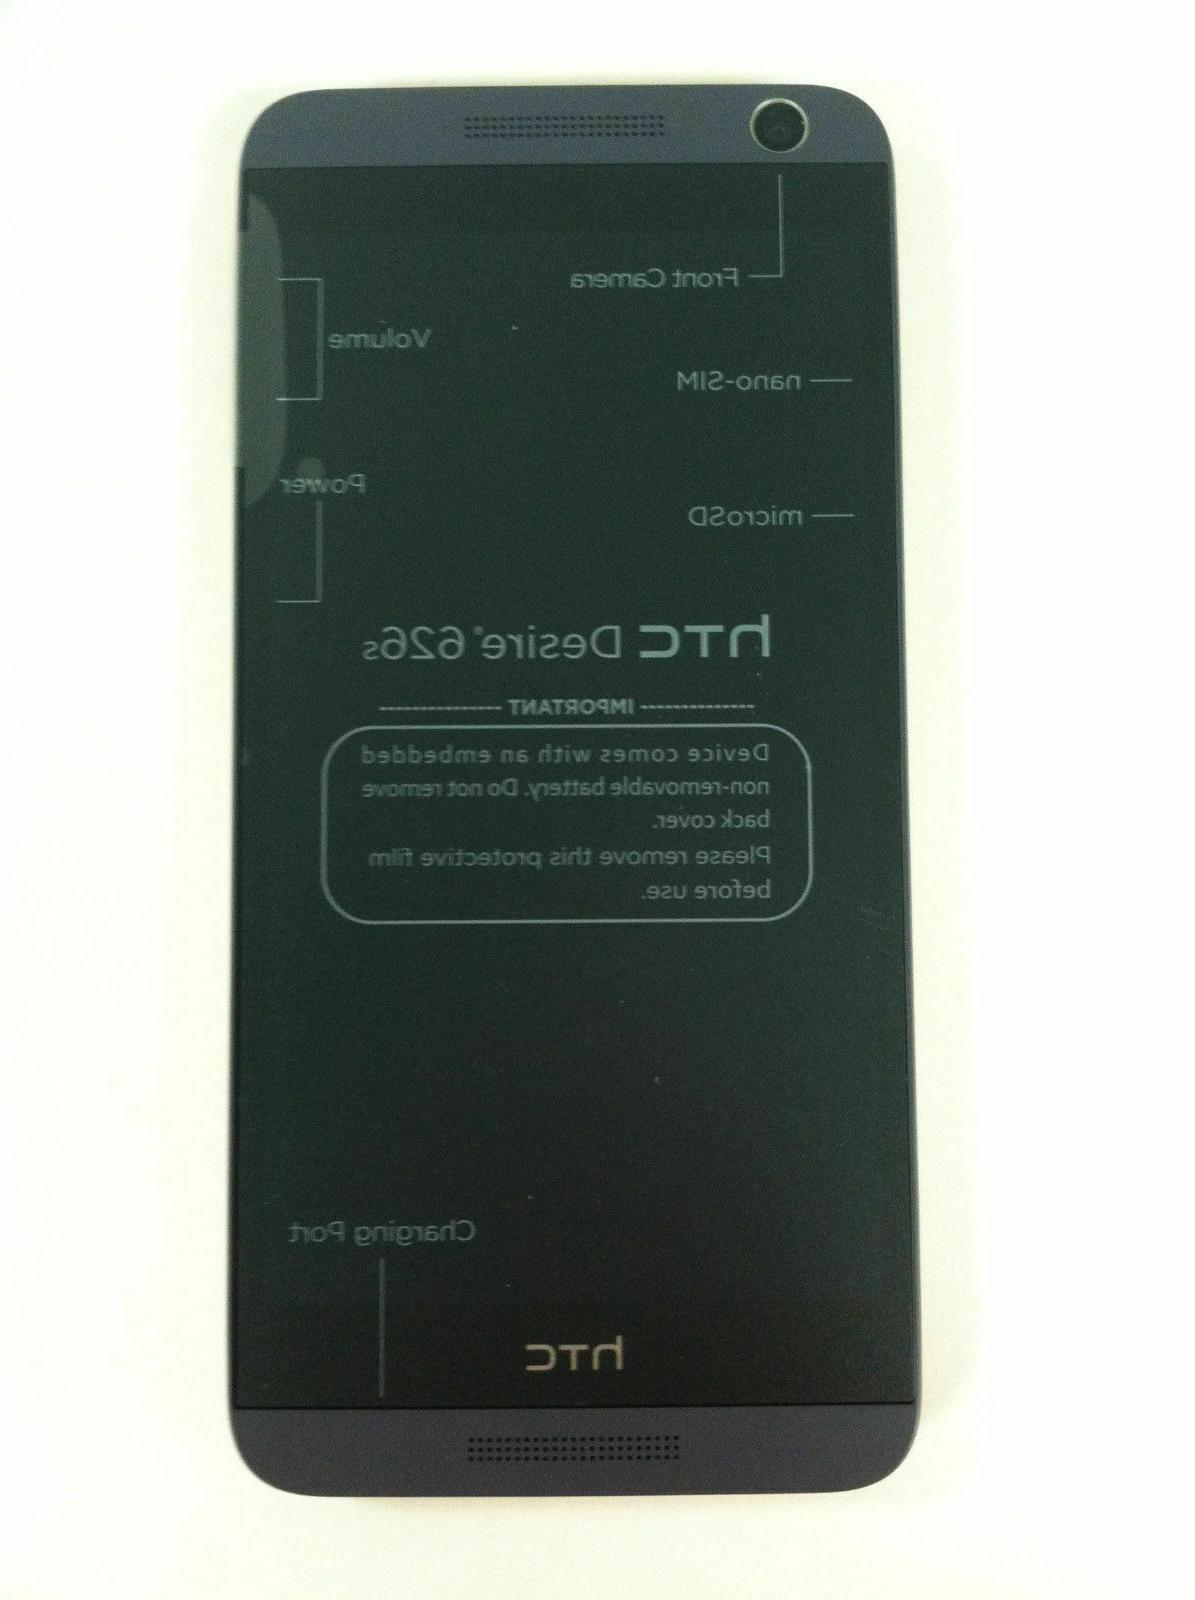 HTC Unlocked 4G GSM Smartphone